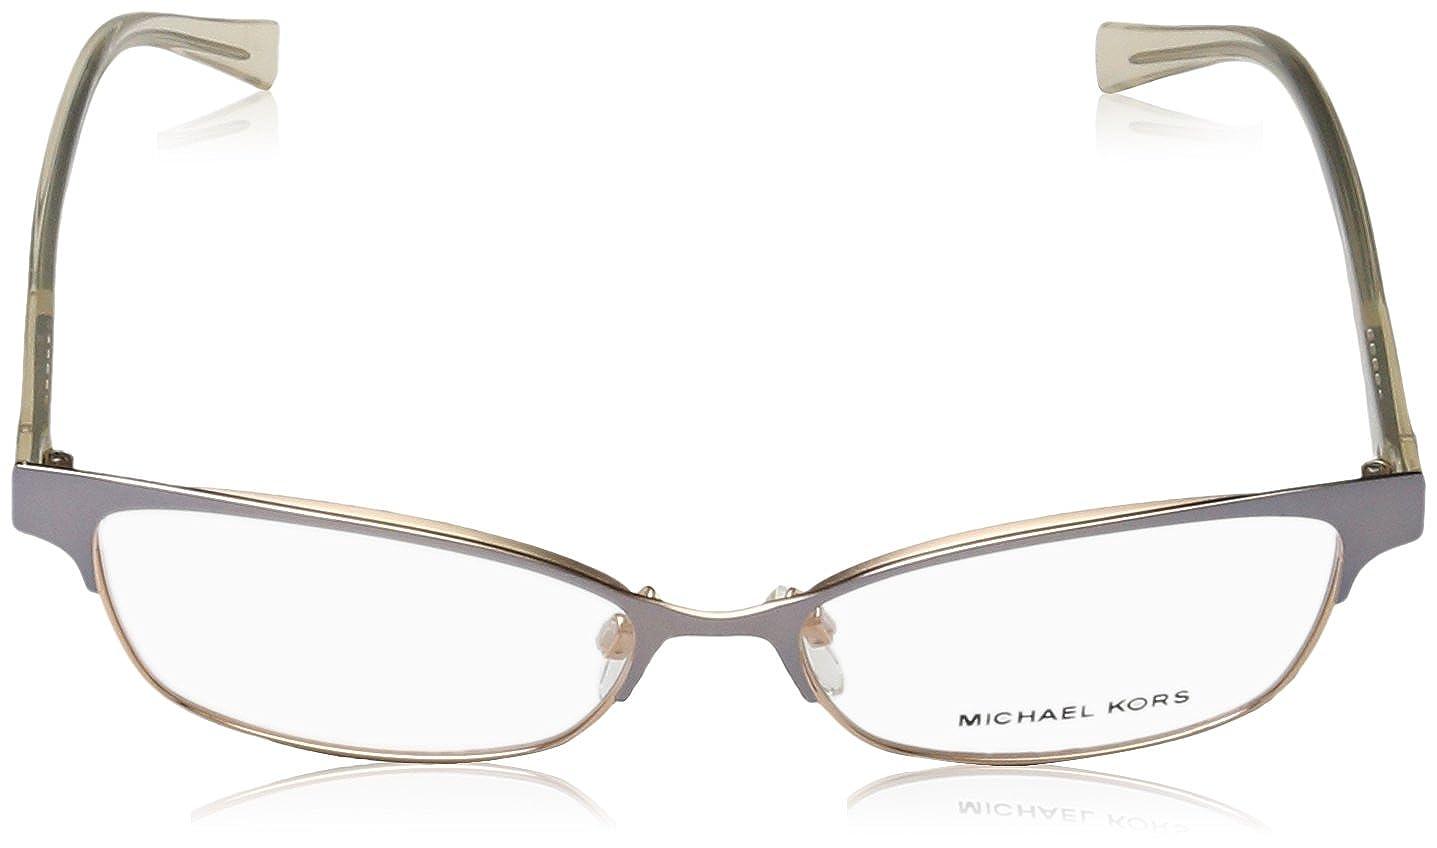 4735966c516 MICHAEL KORS MK 7004 Eyeglasses 1030 Light Gun Rose Gold 53-15-140   Amazon.co.uk  Clothing